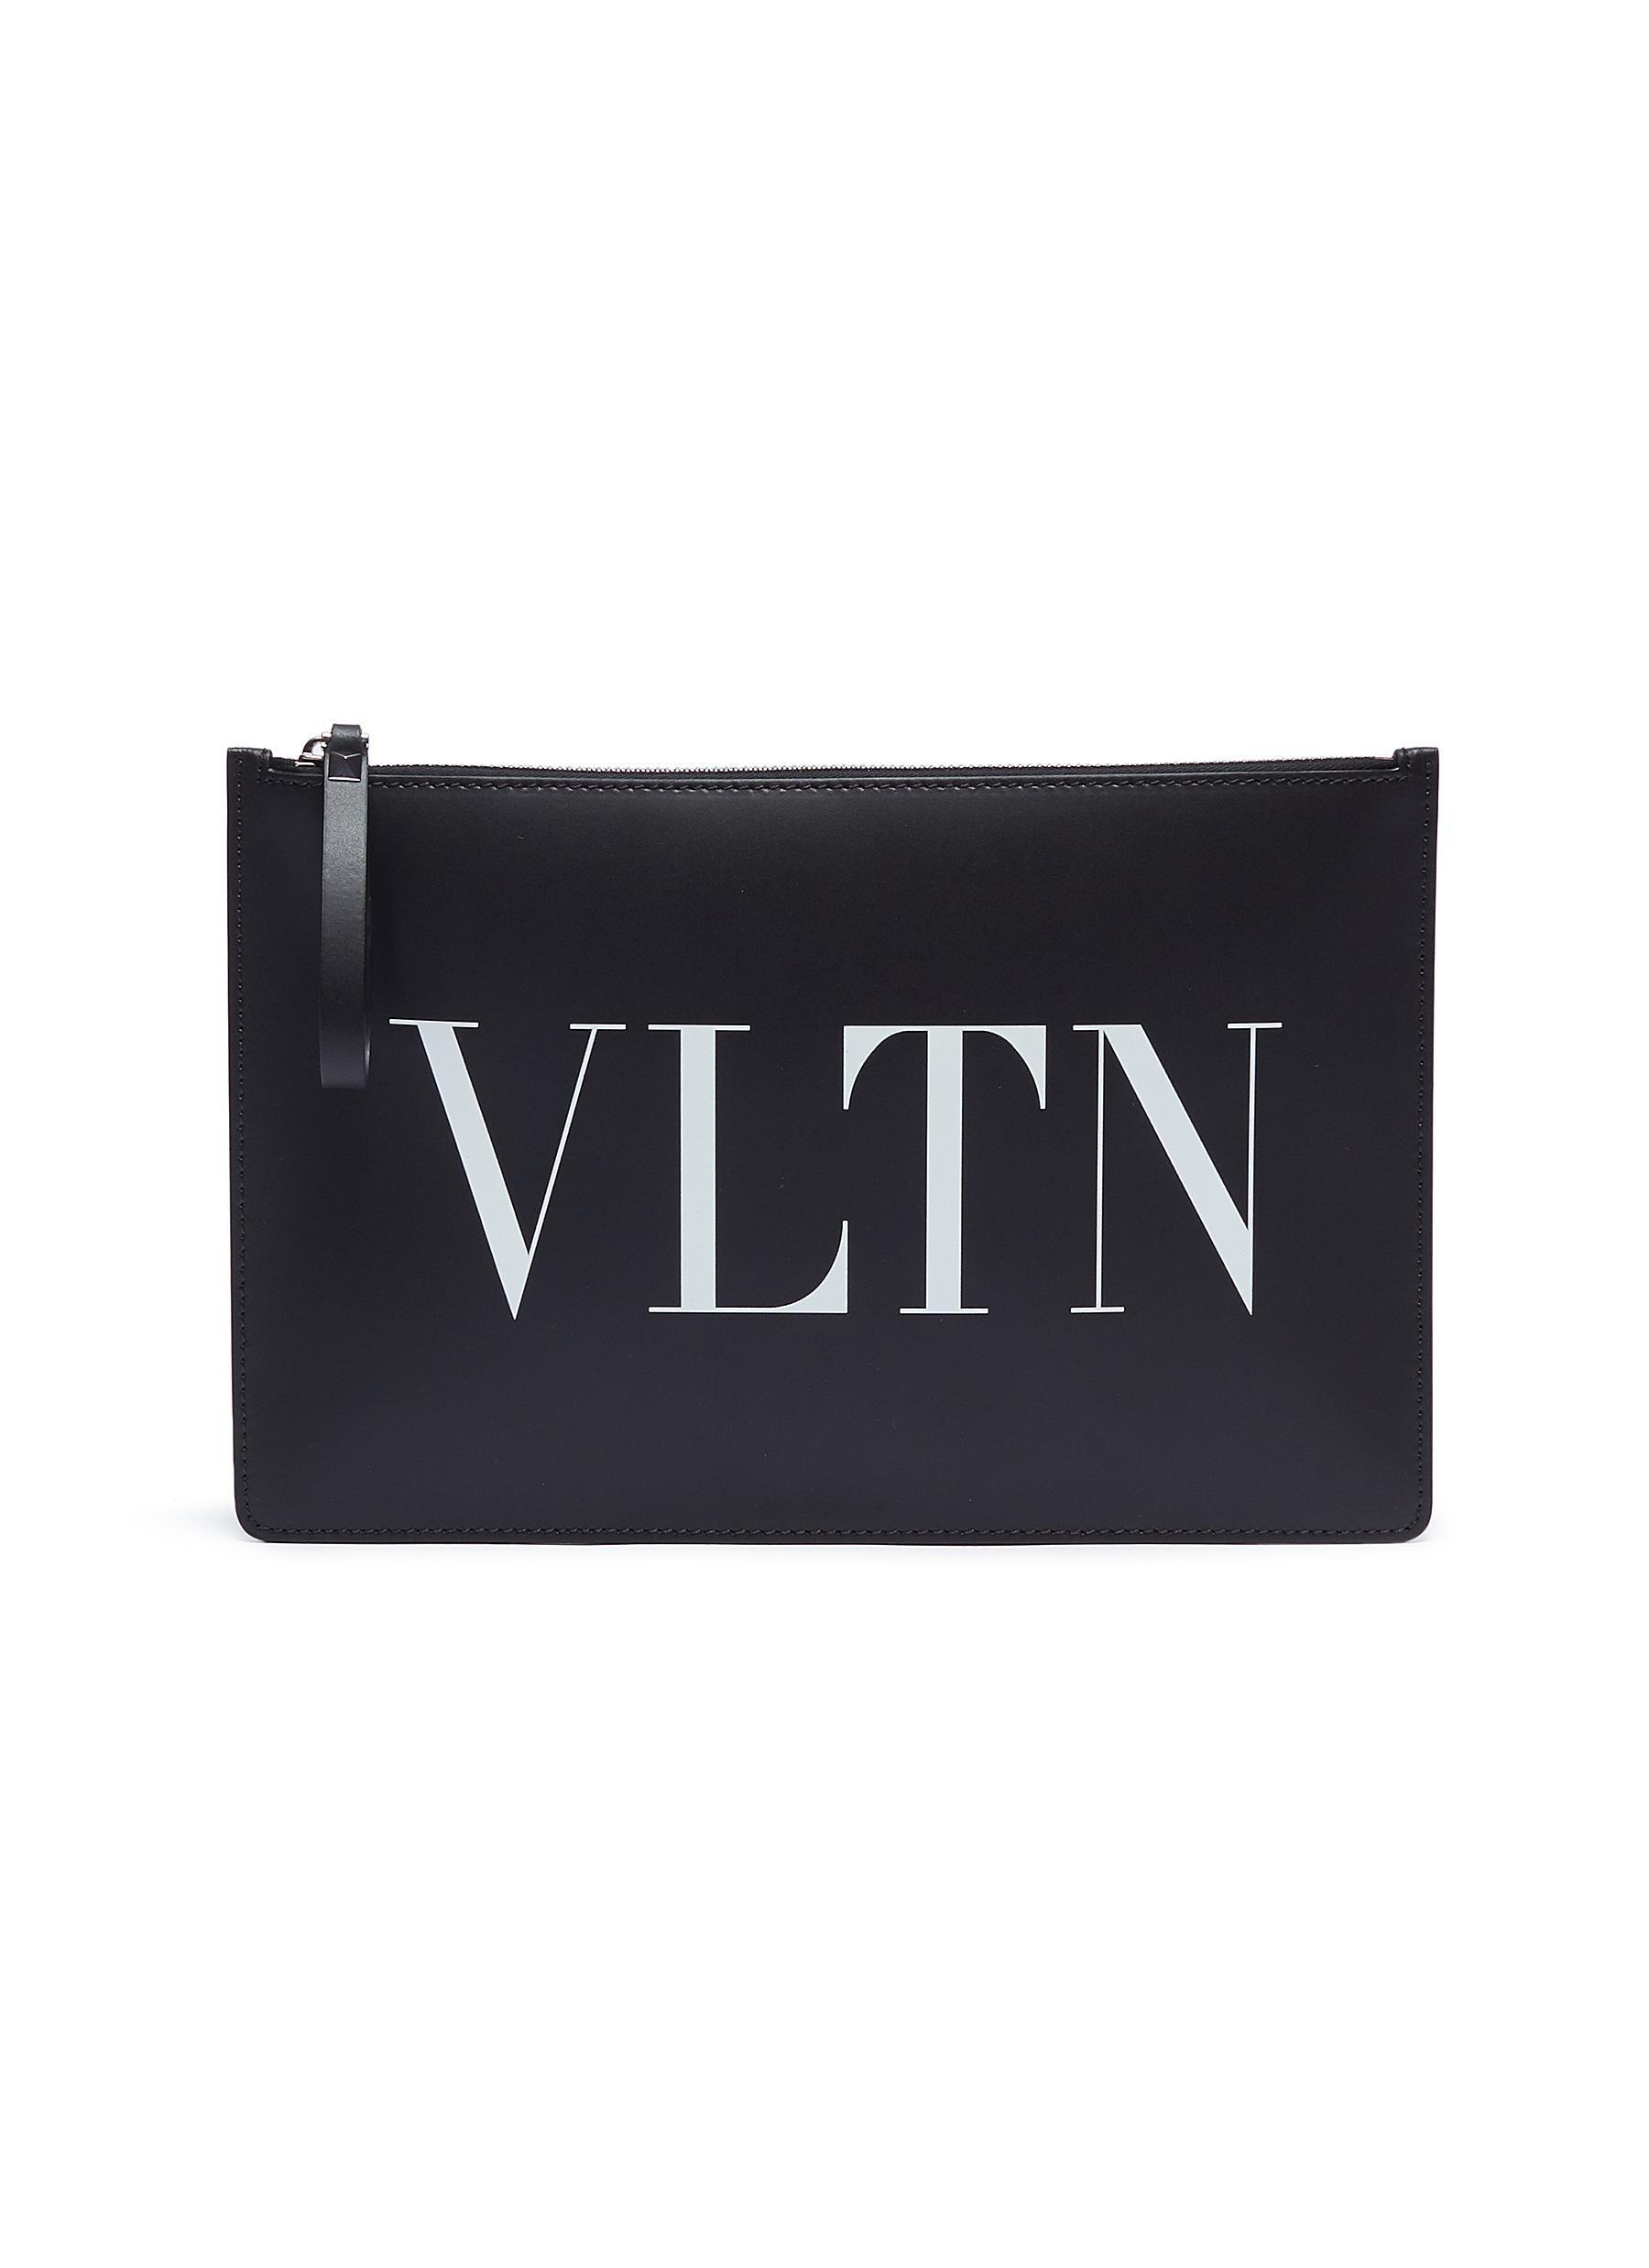 6ac77399e6f9 Valentino - Black Logo Print Leather Zip Pouch for Men - Lyst. View  fullscreen